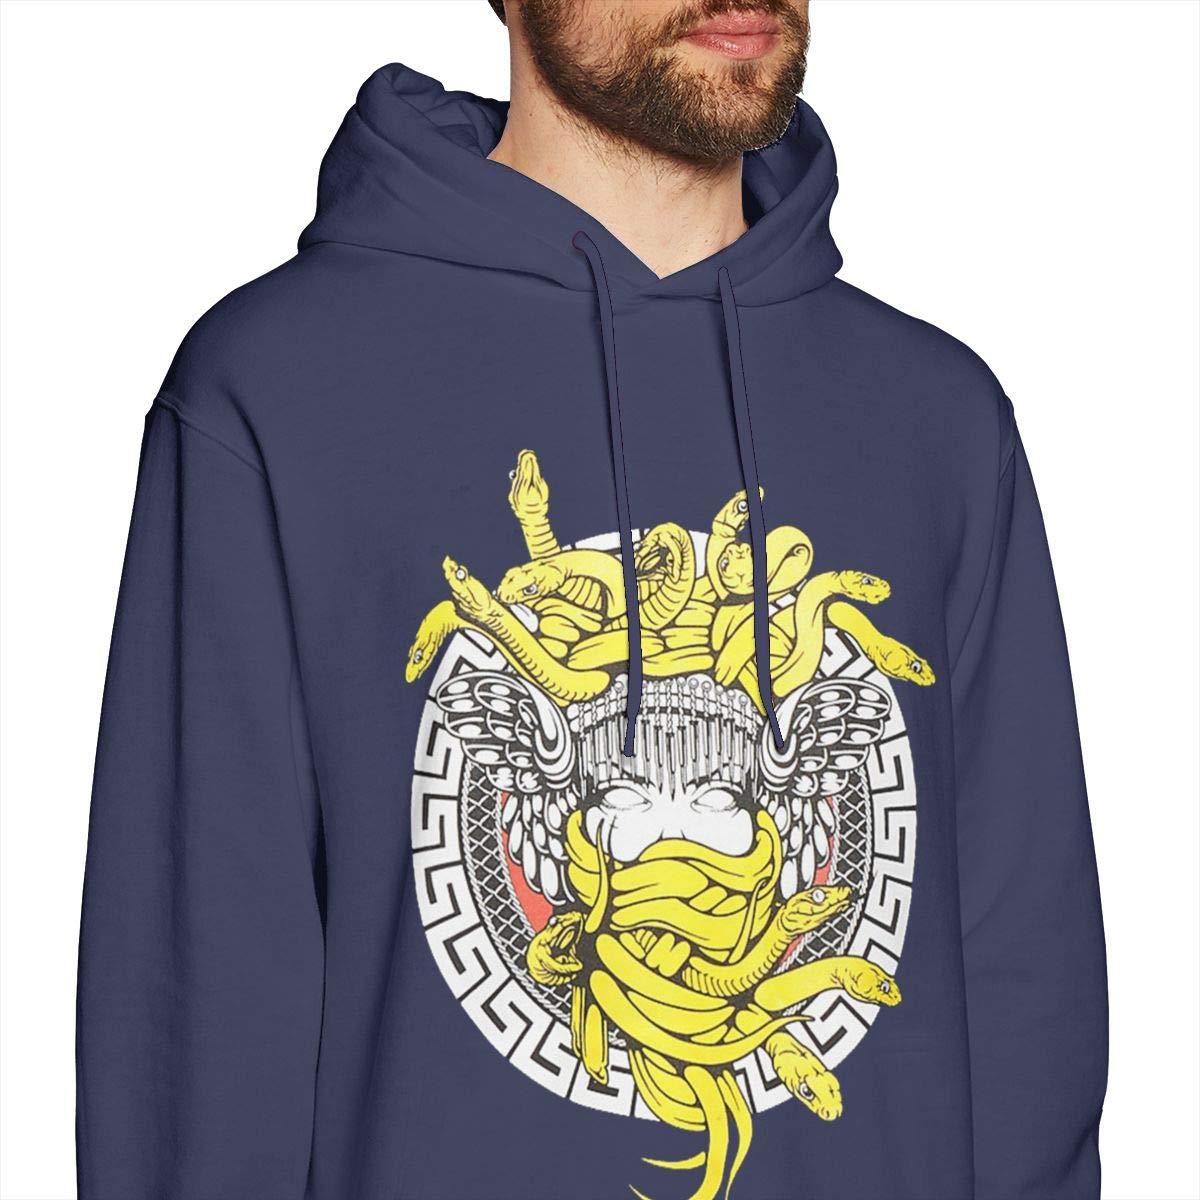 GRaconndeg Mens Crooks and Castles Medusa Trend Navy Hoodie Sweatshirt Jacket Pullover Tops